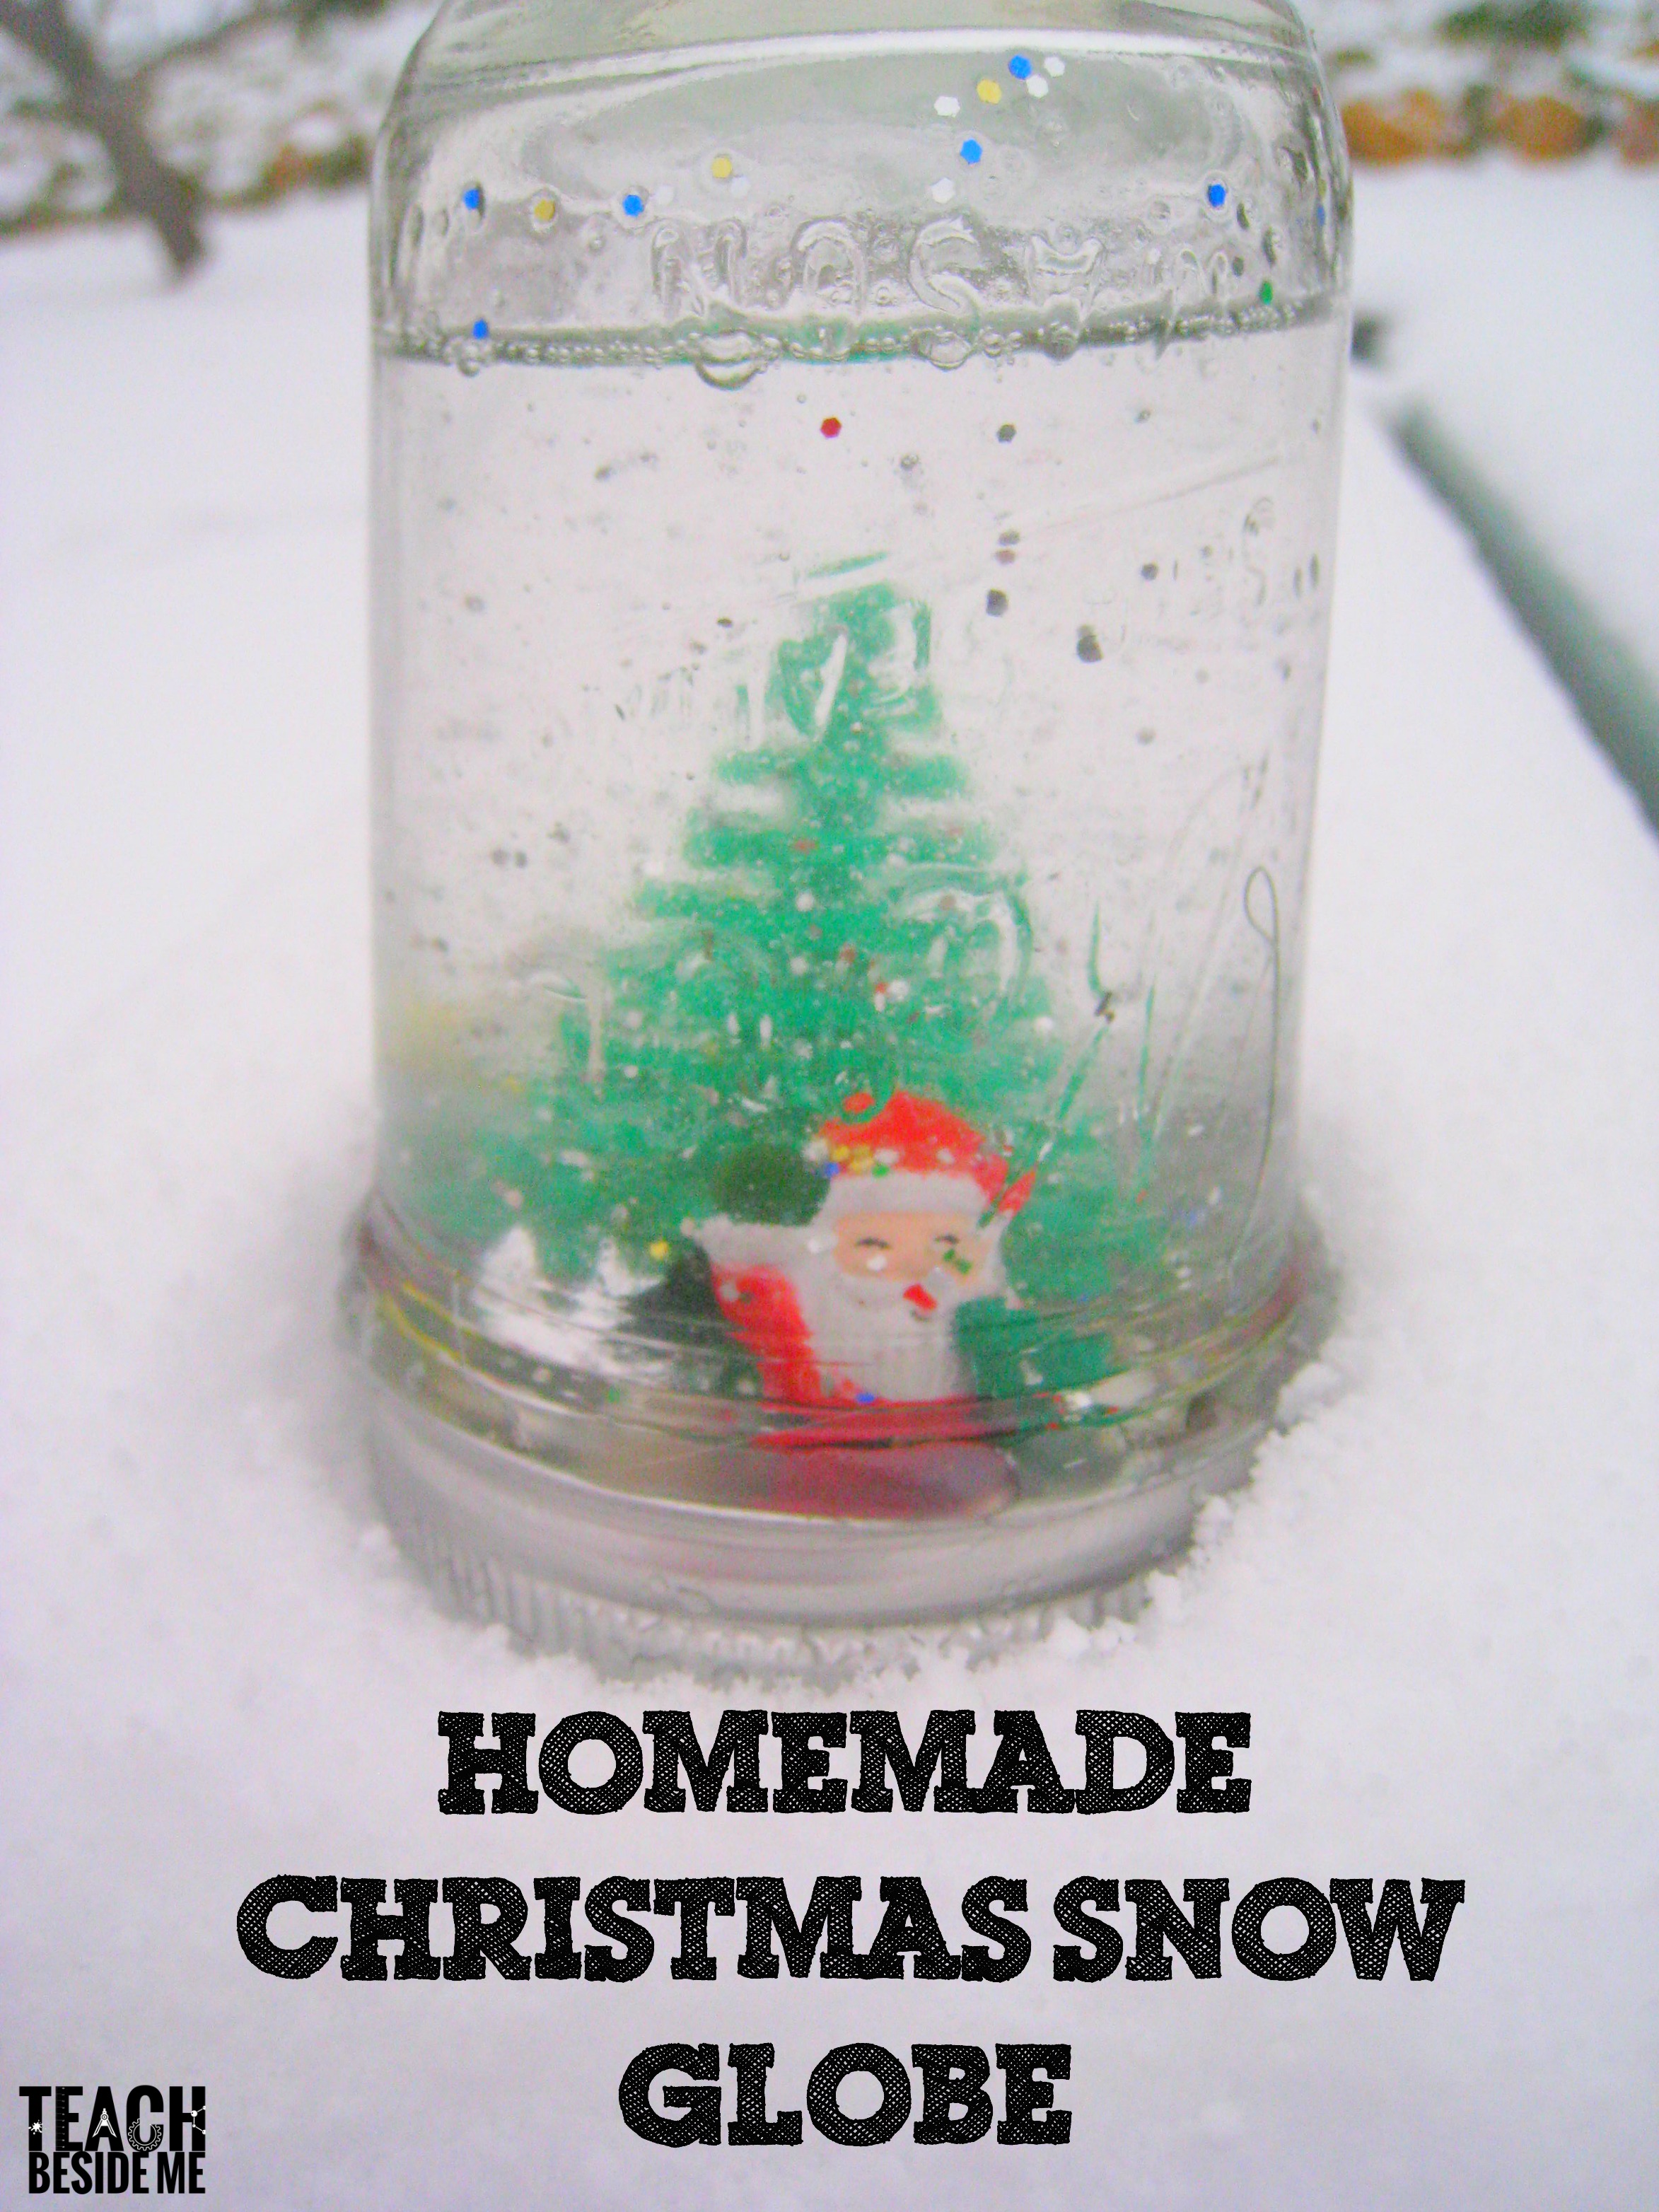 Christmas craft homemade snow globe teach beside me for Easy homemade christmas snow globes